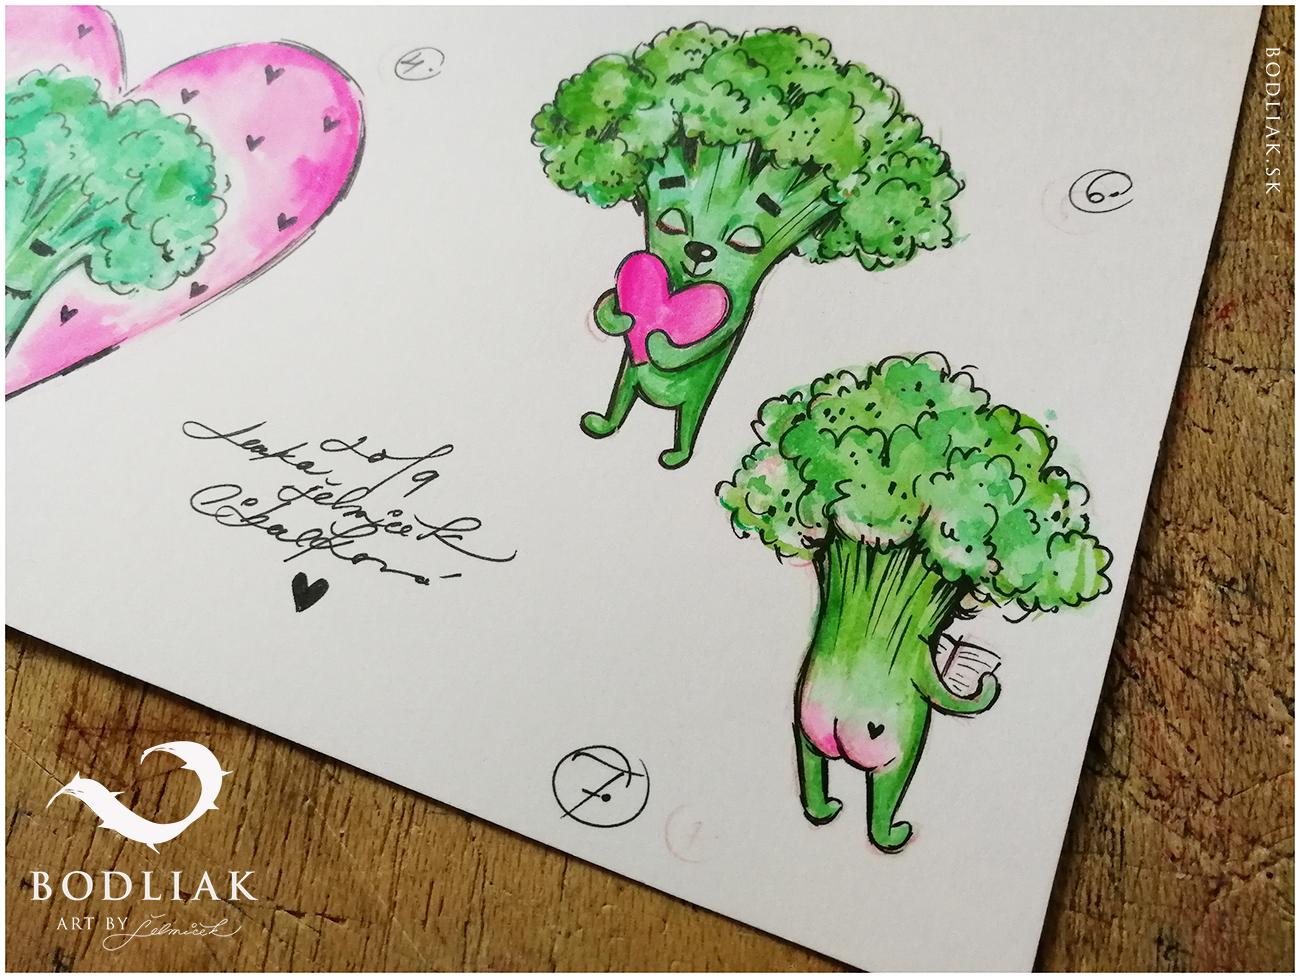 autor: Lenka Selmiček   Brokolička držiaca srdce  - 6,5cm x 5,5cm …  Brokolička s riťkou, čítajúca  - 5,5cm x 4,5c